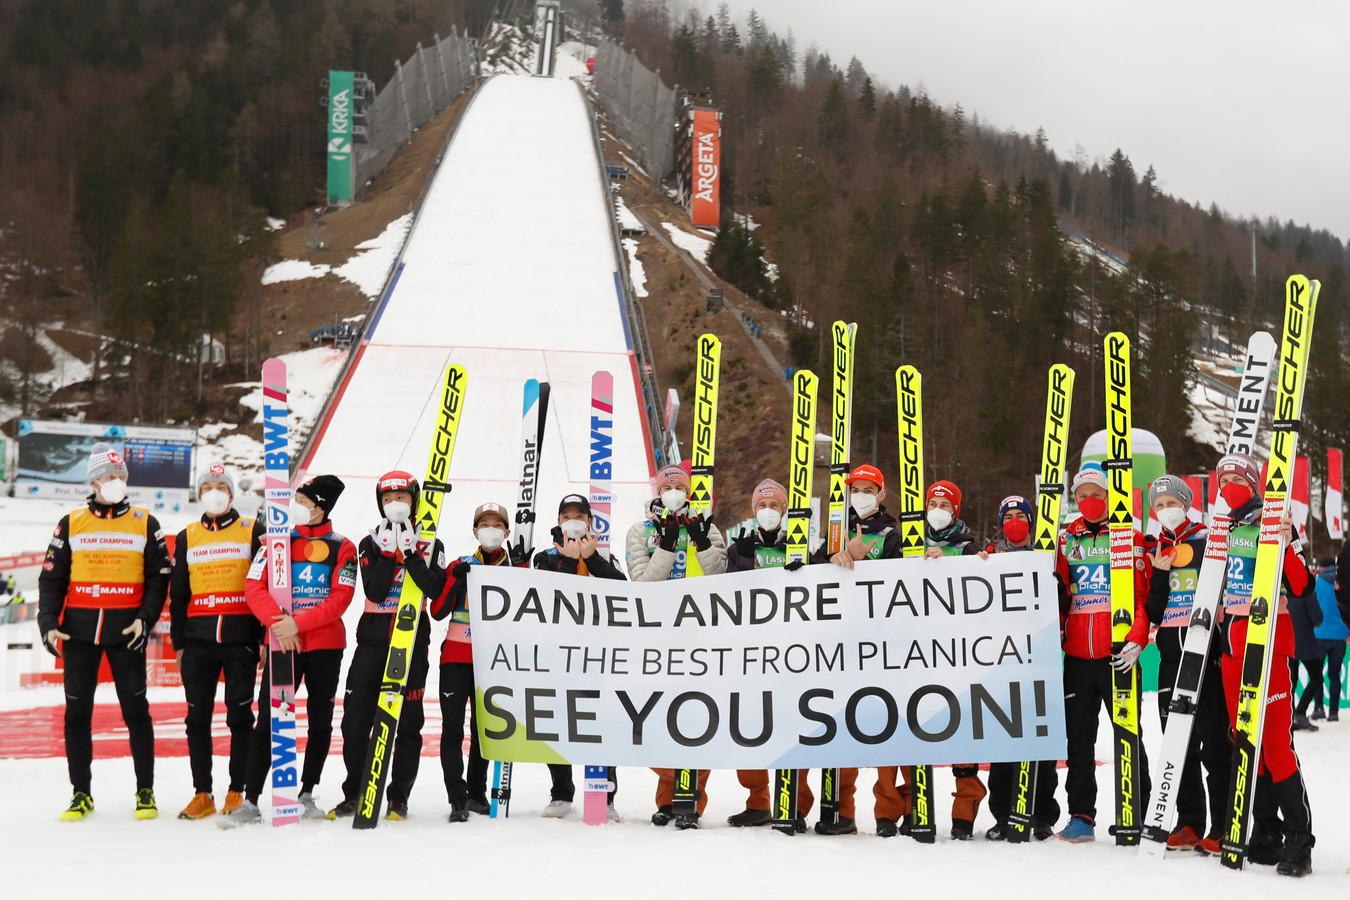 Collega's wensen Daniel-André Tande sterkte.